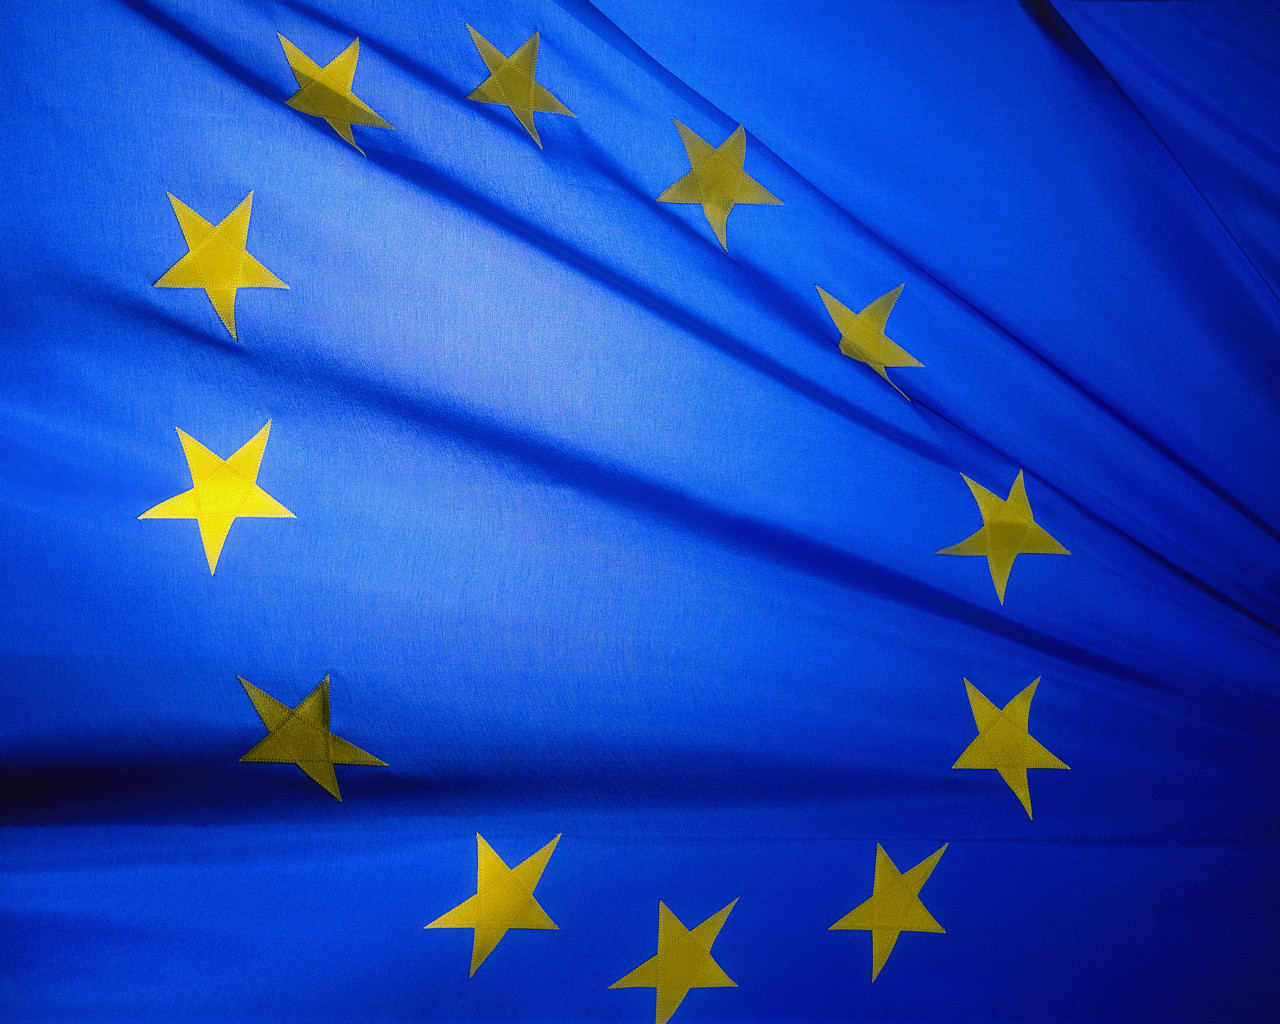 [COO Blog] José Maria Álvarez-Pallete on 'Building a Digital Europe'